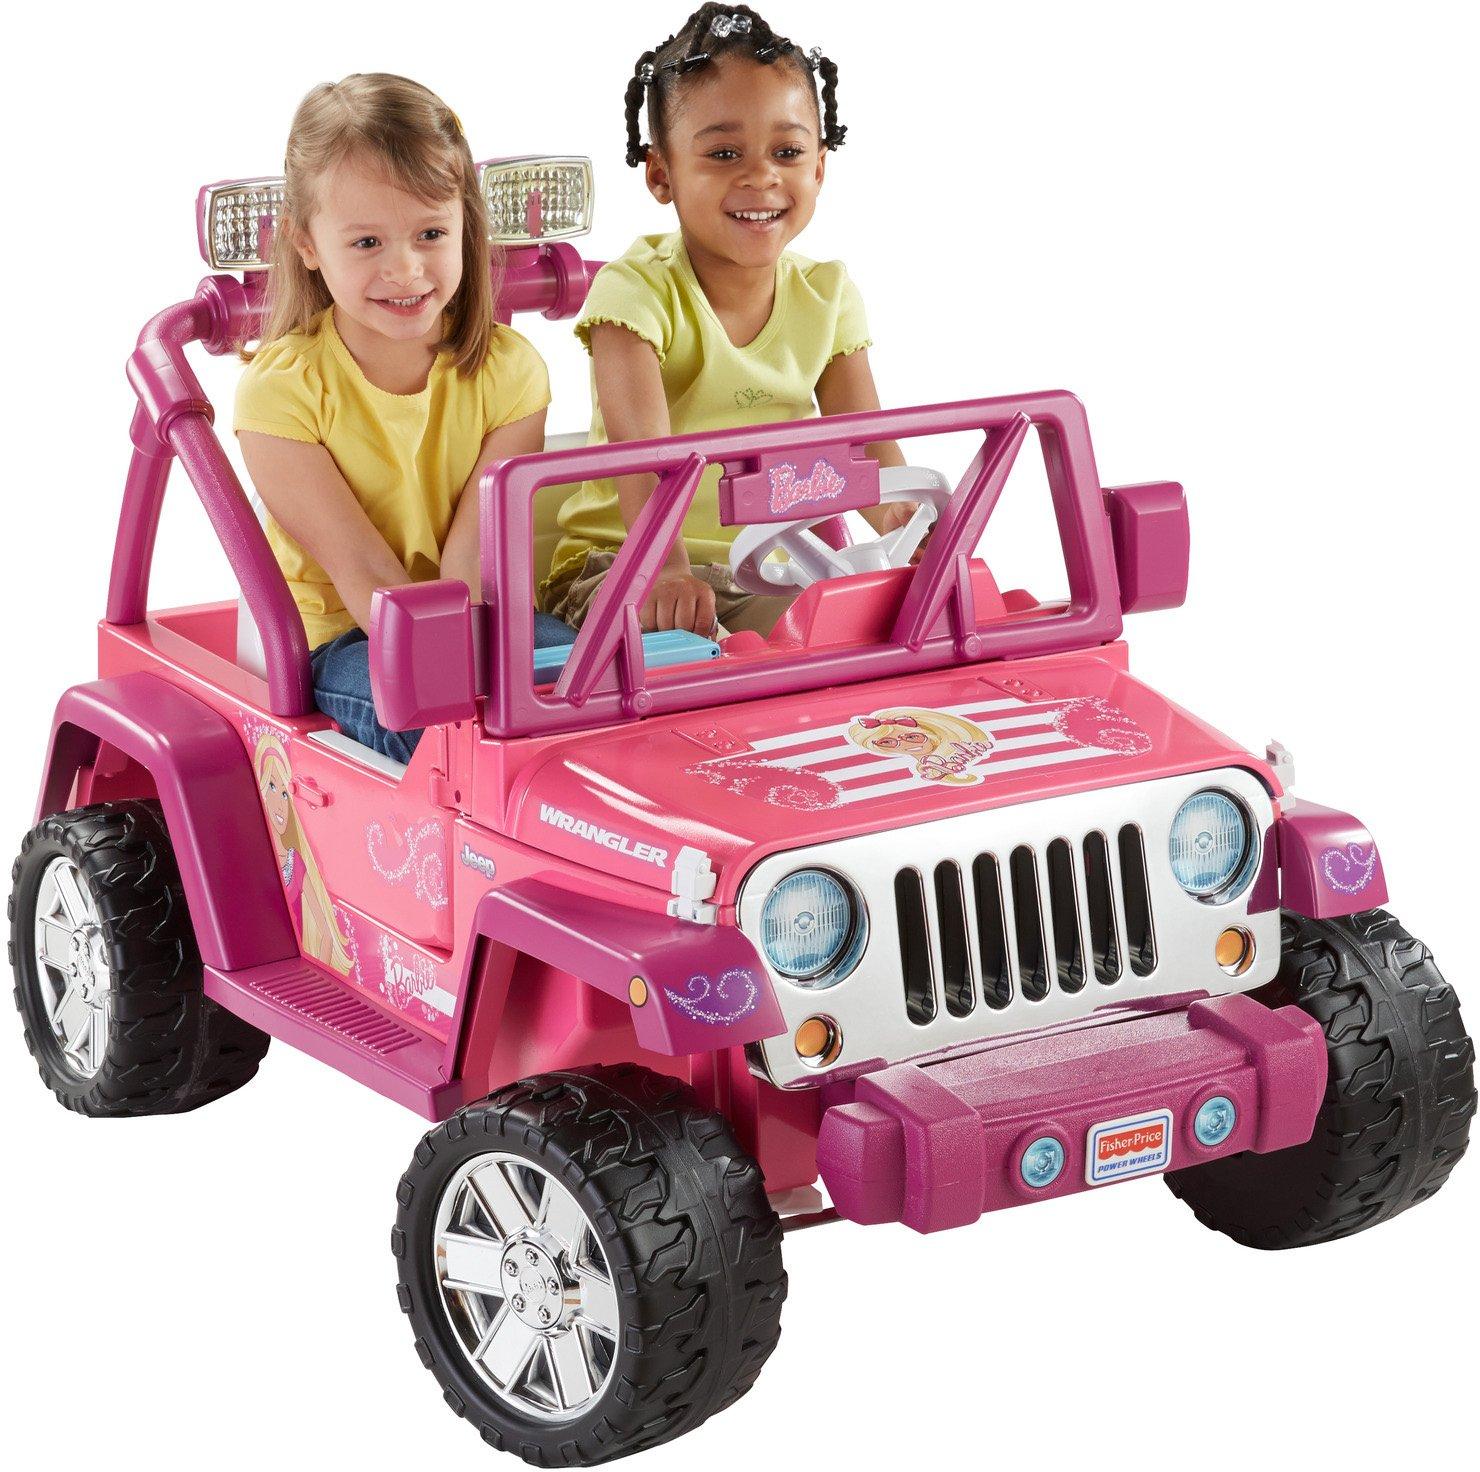 Power Wheels Barbie Deluxe Jeep Wrangler Toys Games Parts Diagram